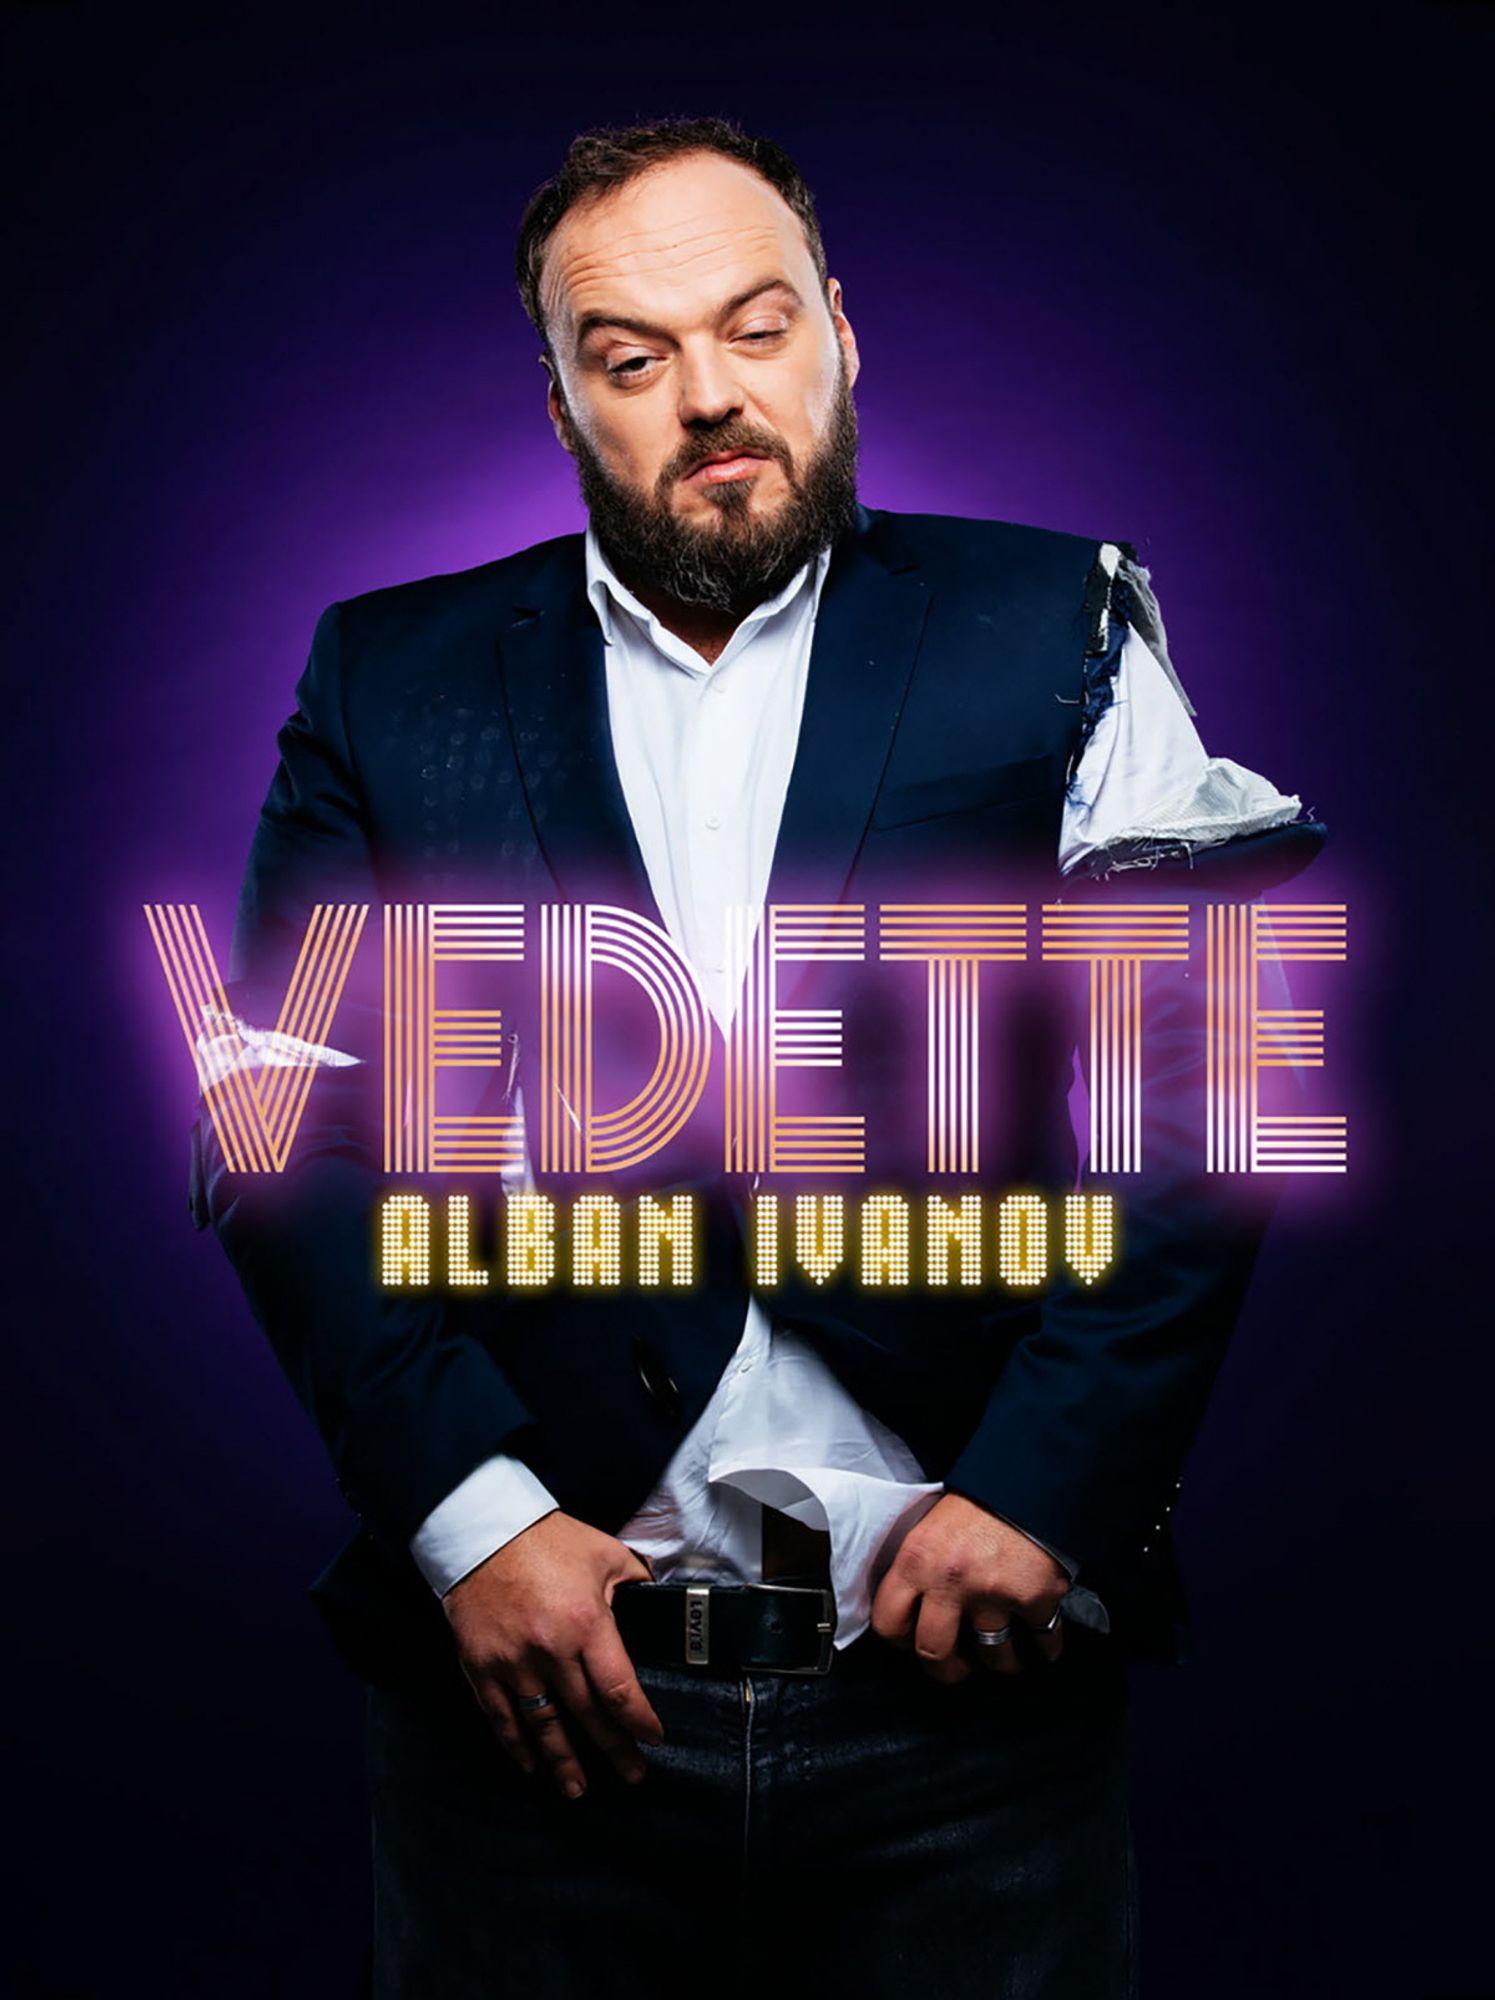 albanivanov_vedette